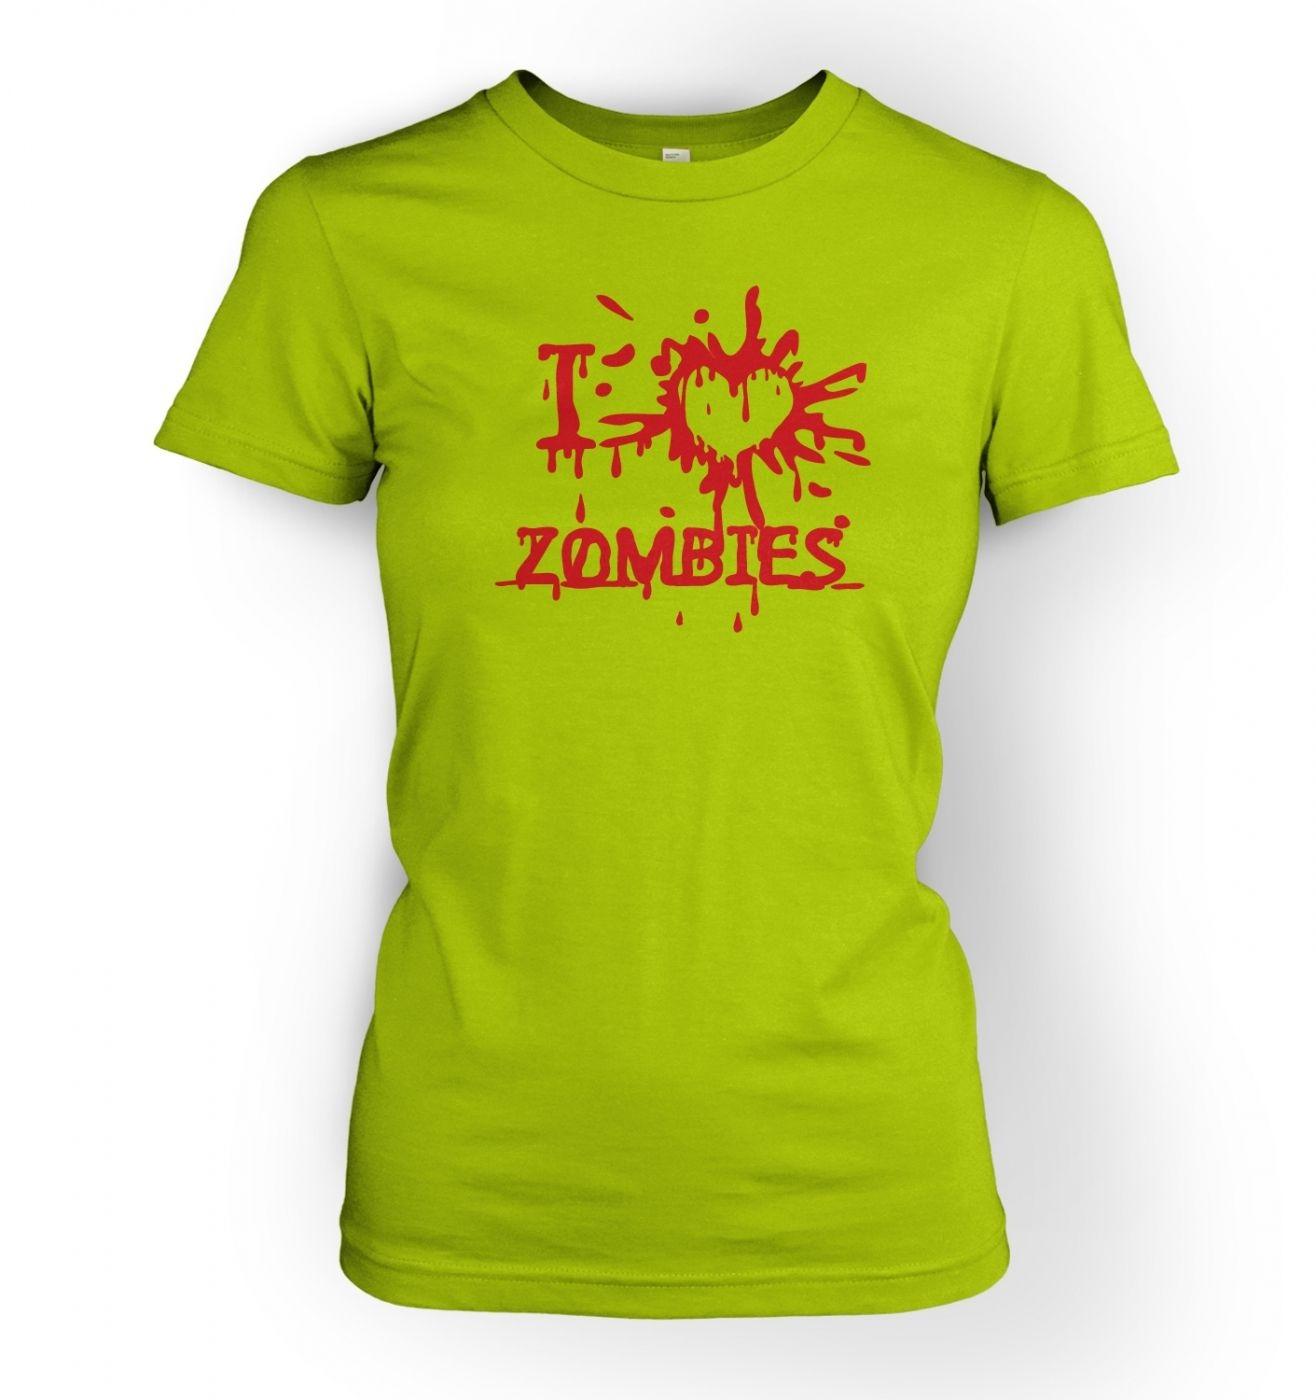 Women's I heart zombies t-shirt